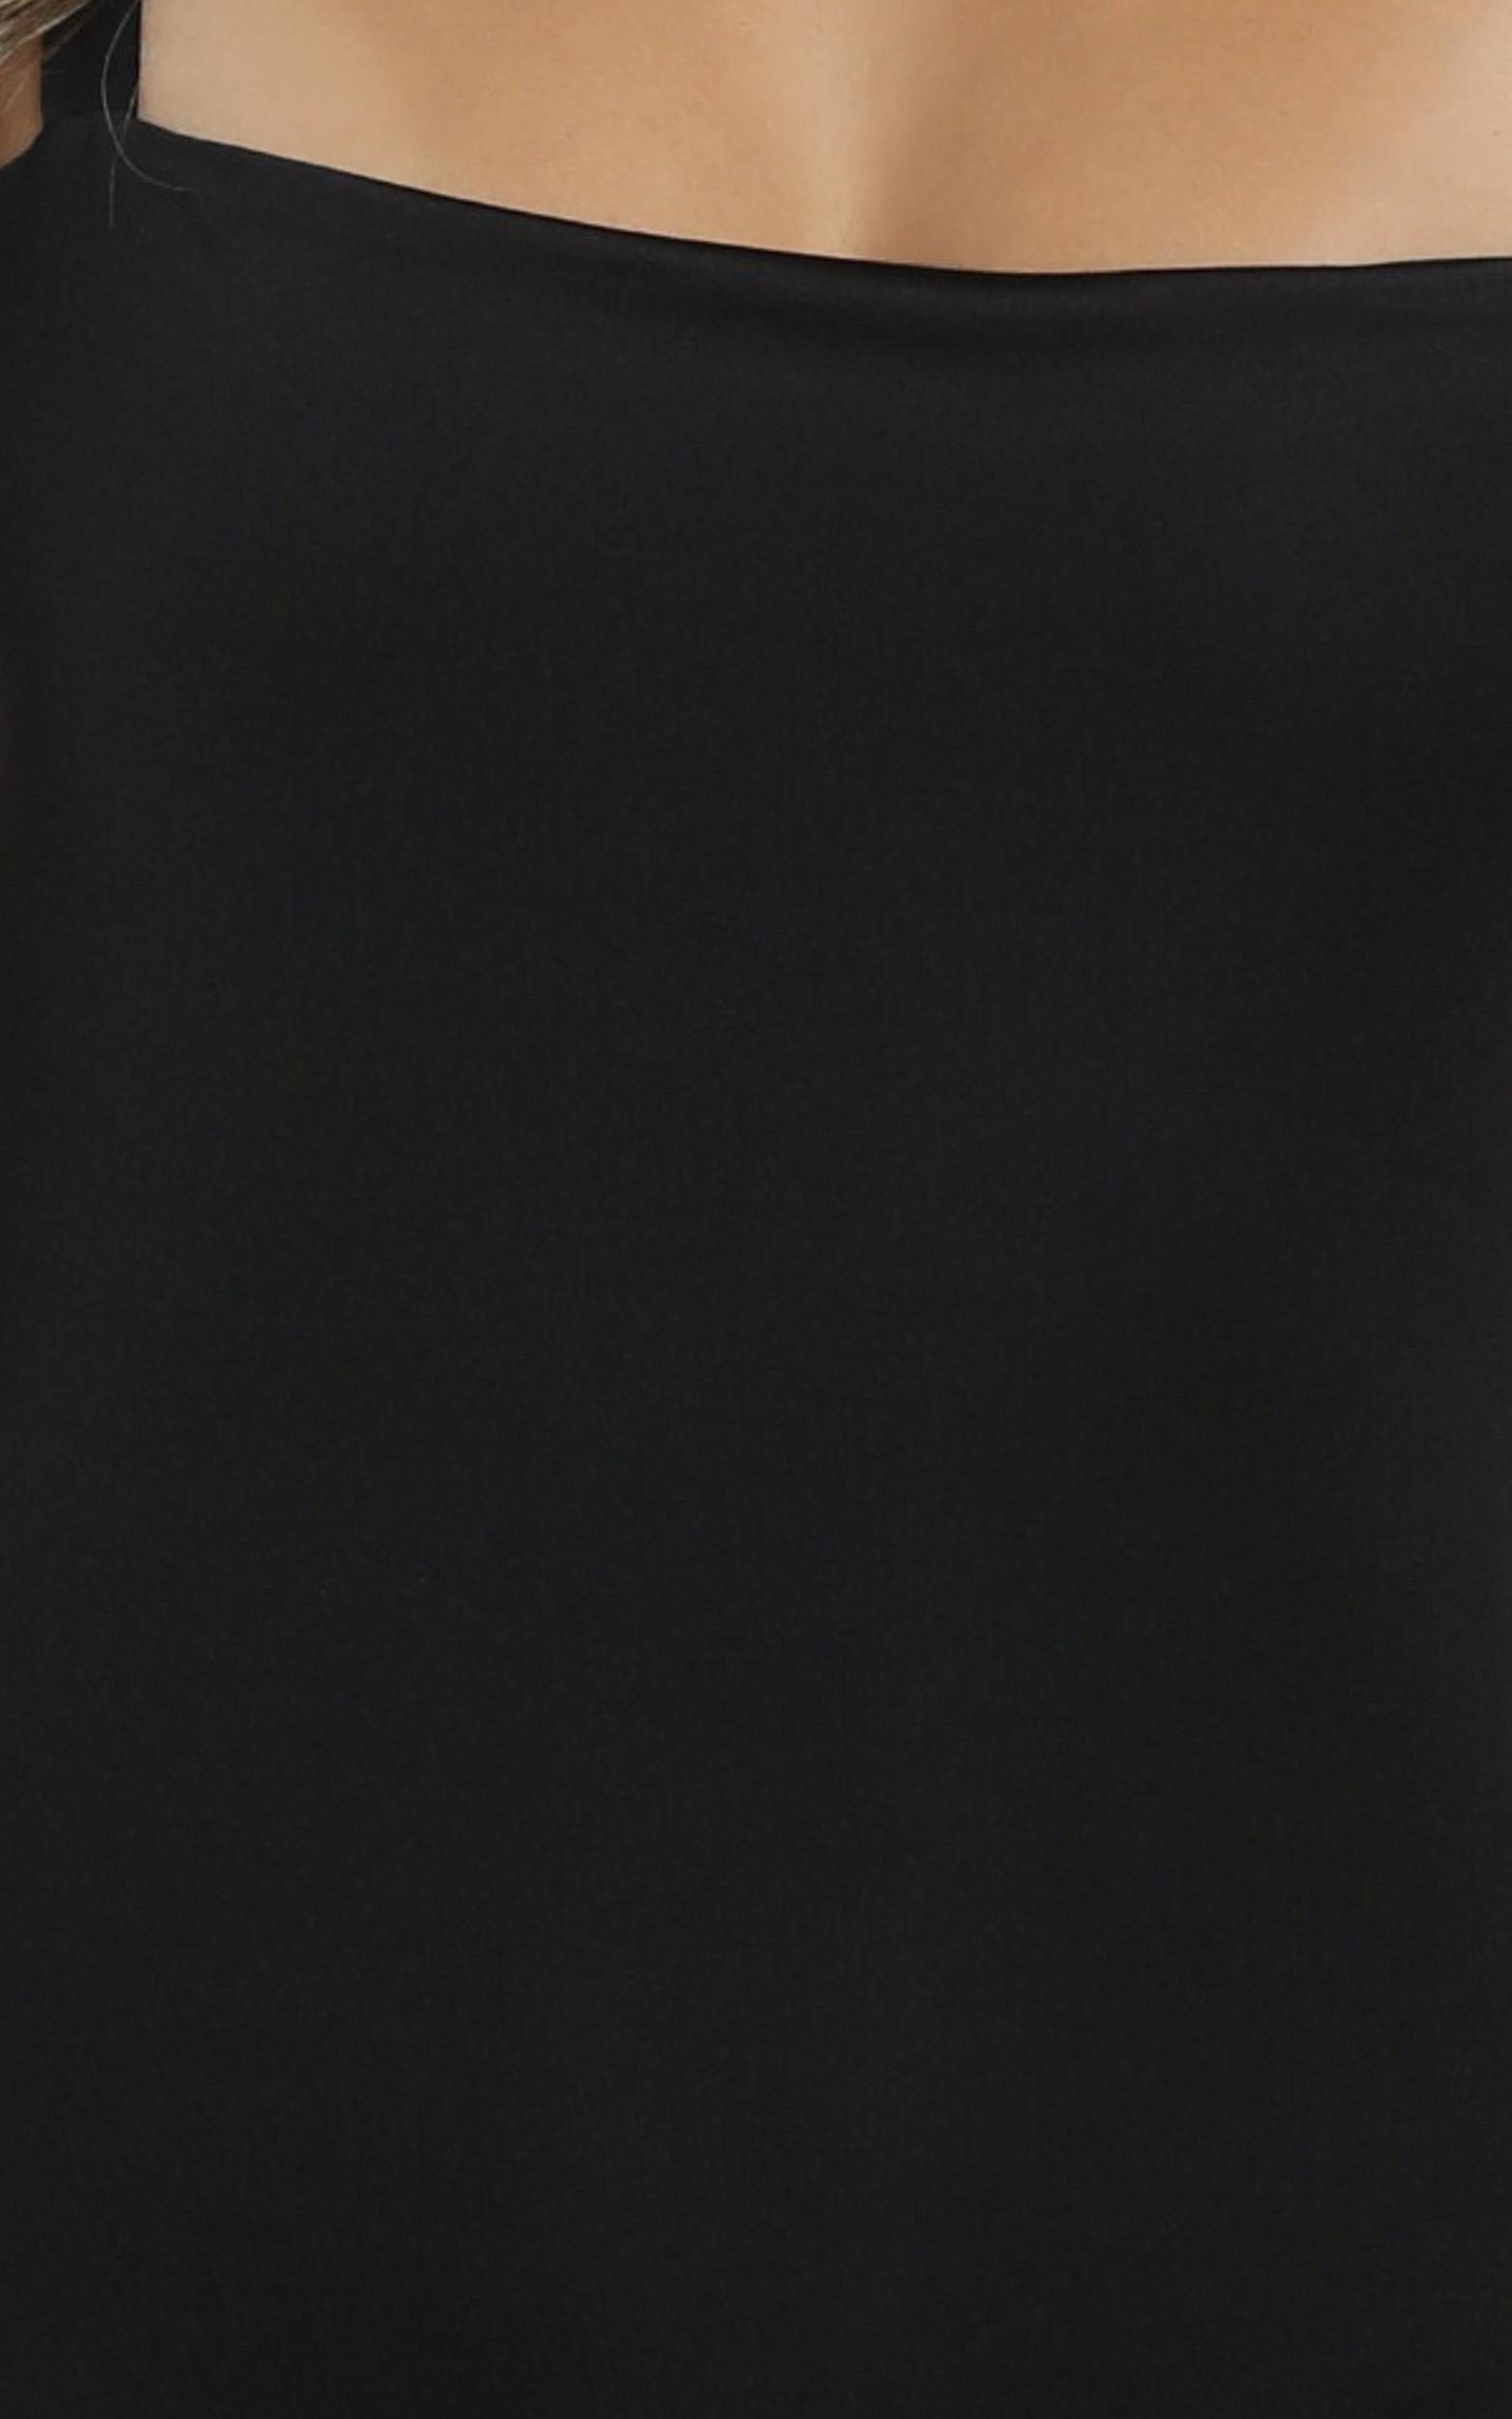 Crave Me bodysuit in black - 20 (XXXXL), Black, hi-res image number null